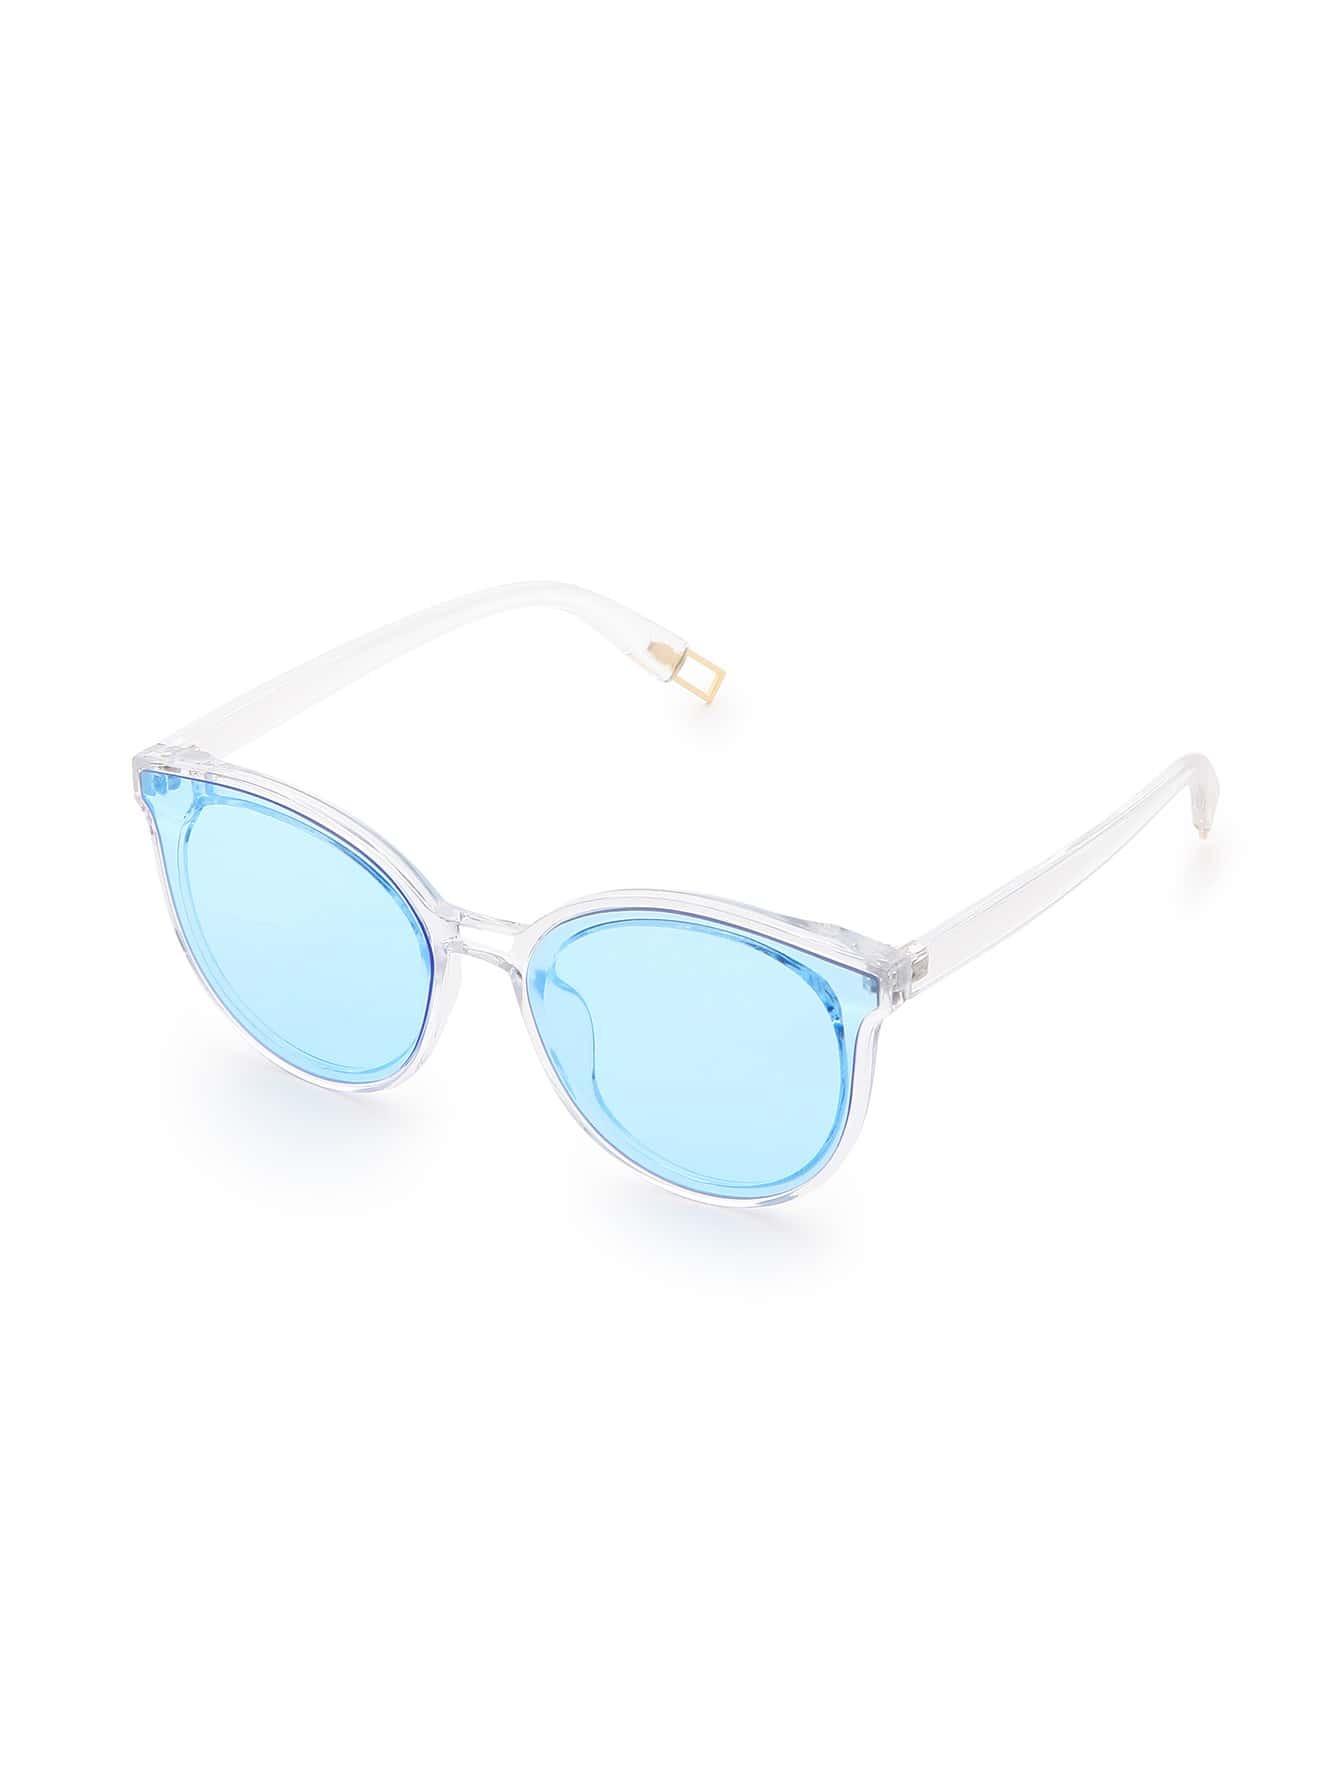 Clear Frame Blue Lens Sunglasses sunglass170317301